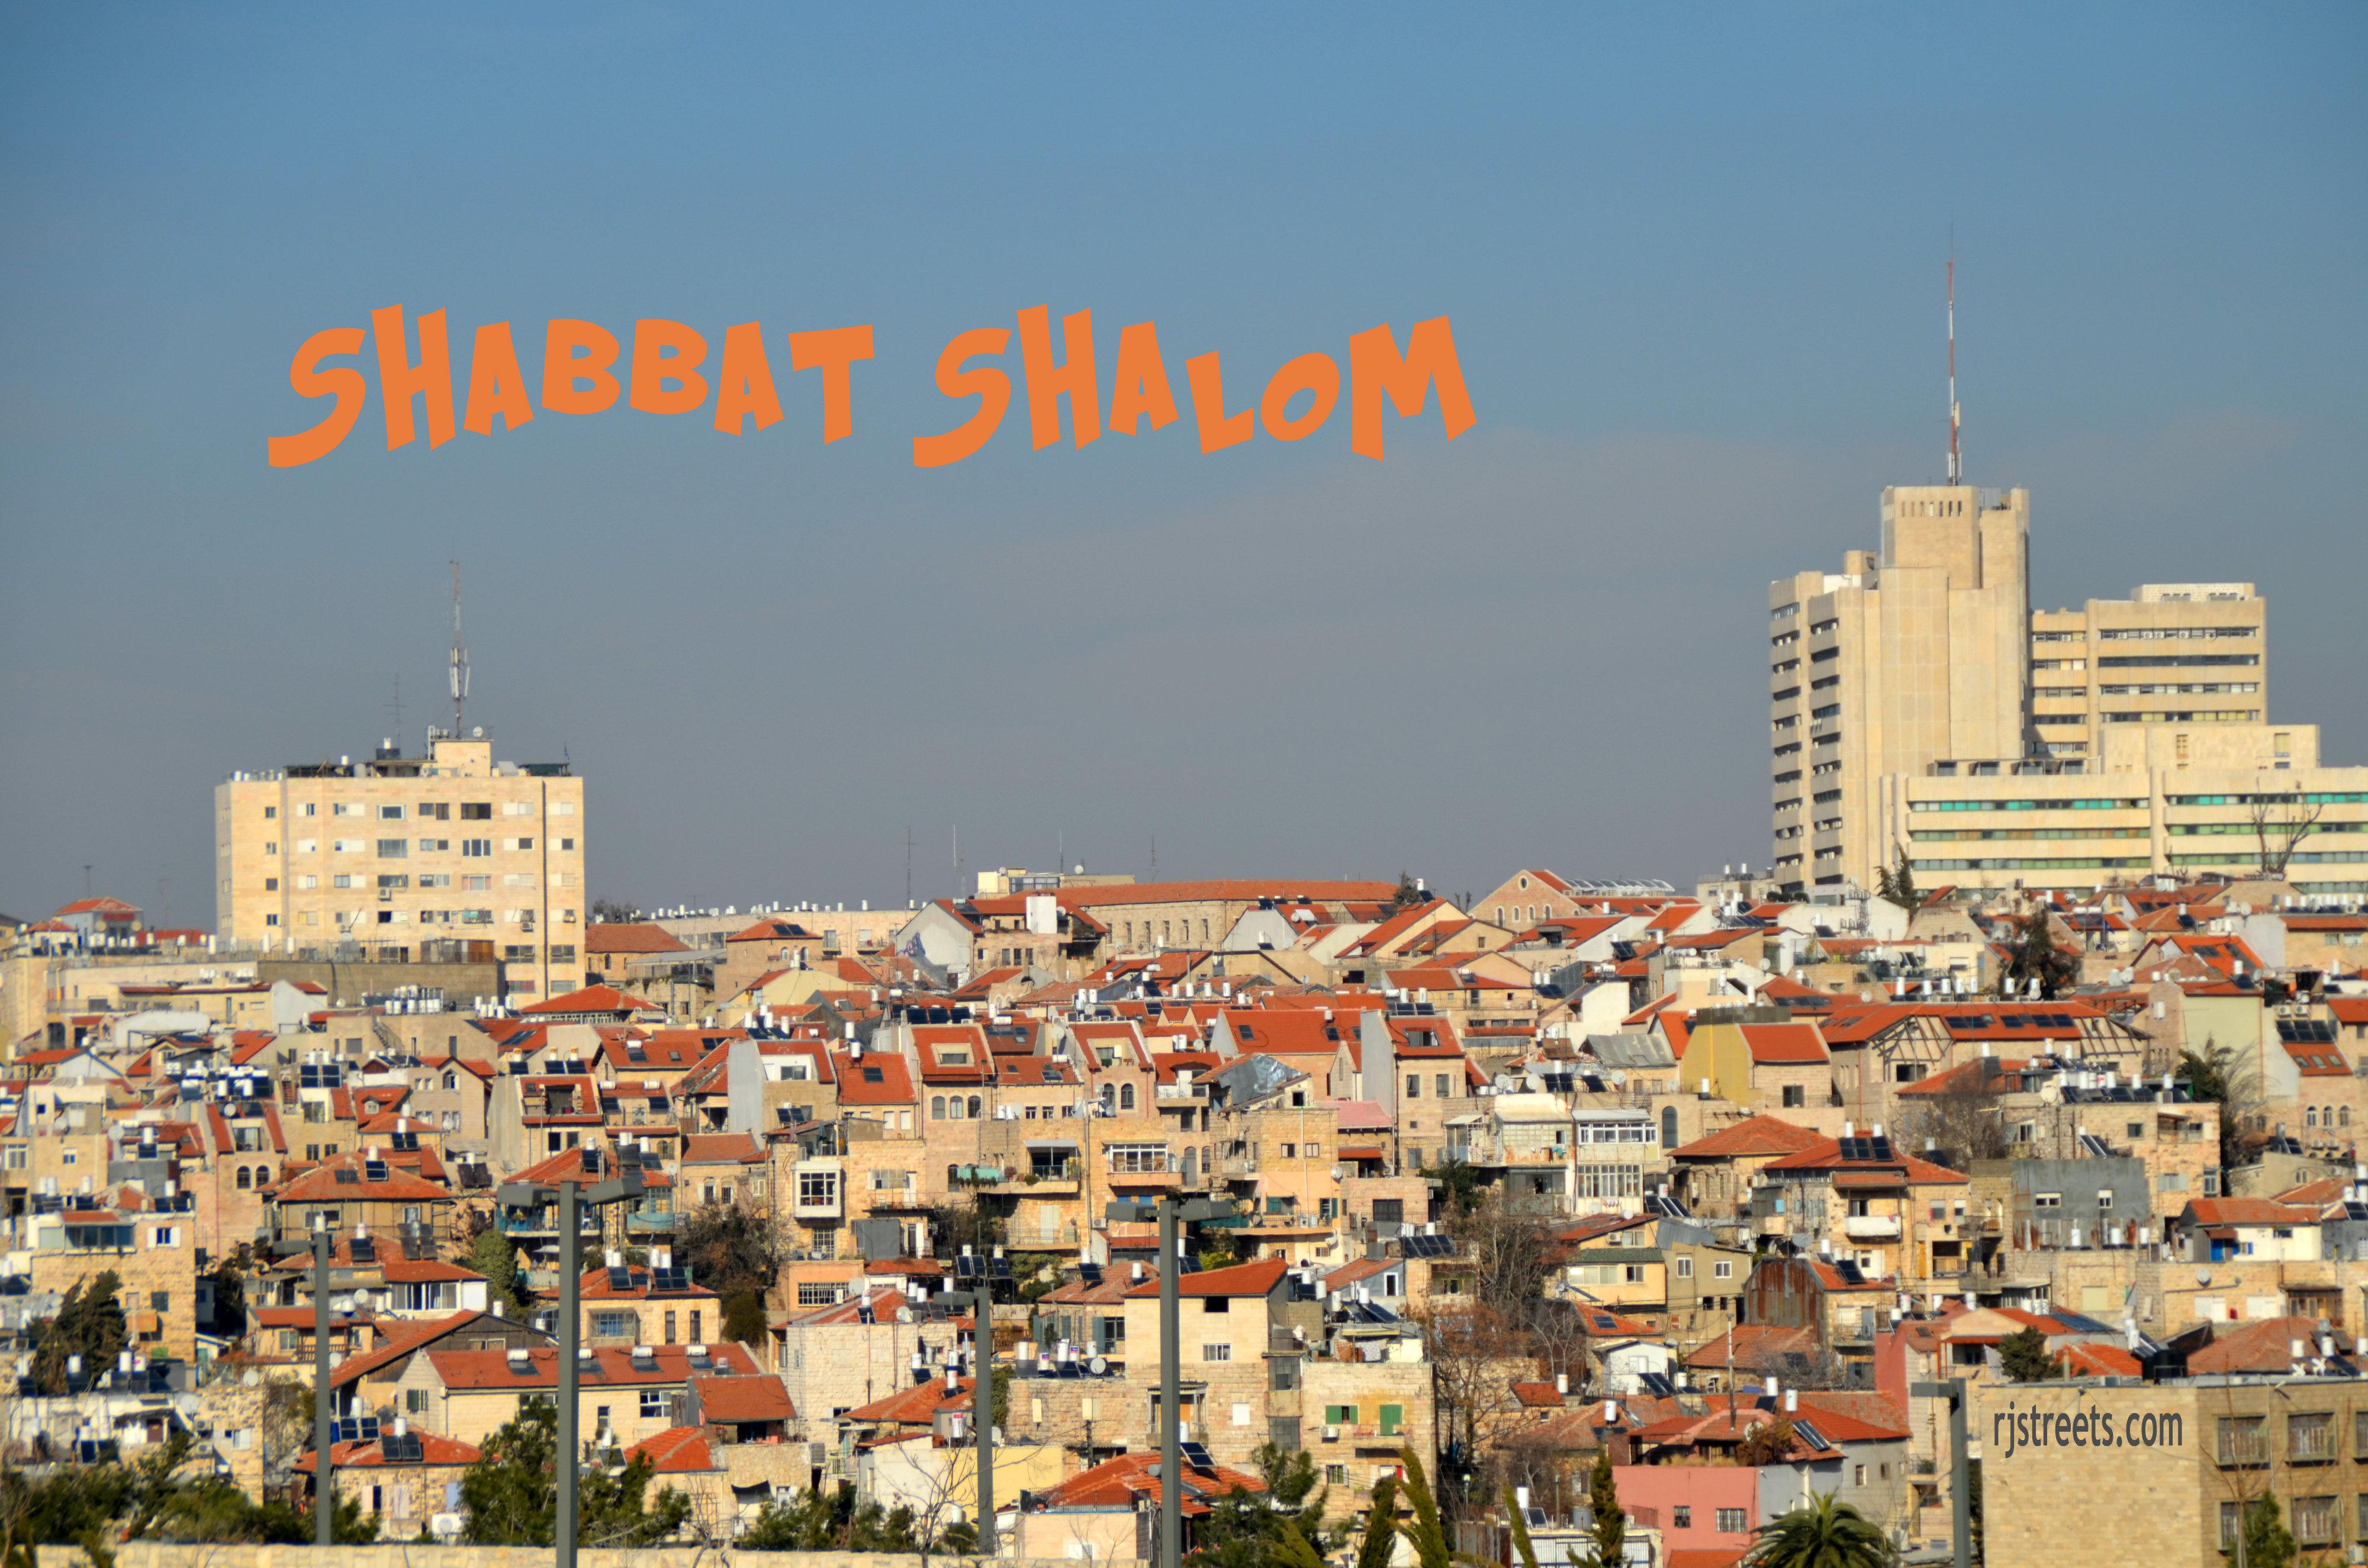 Shabbat Shalom Picture The Real Jerusalem Streets